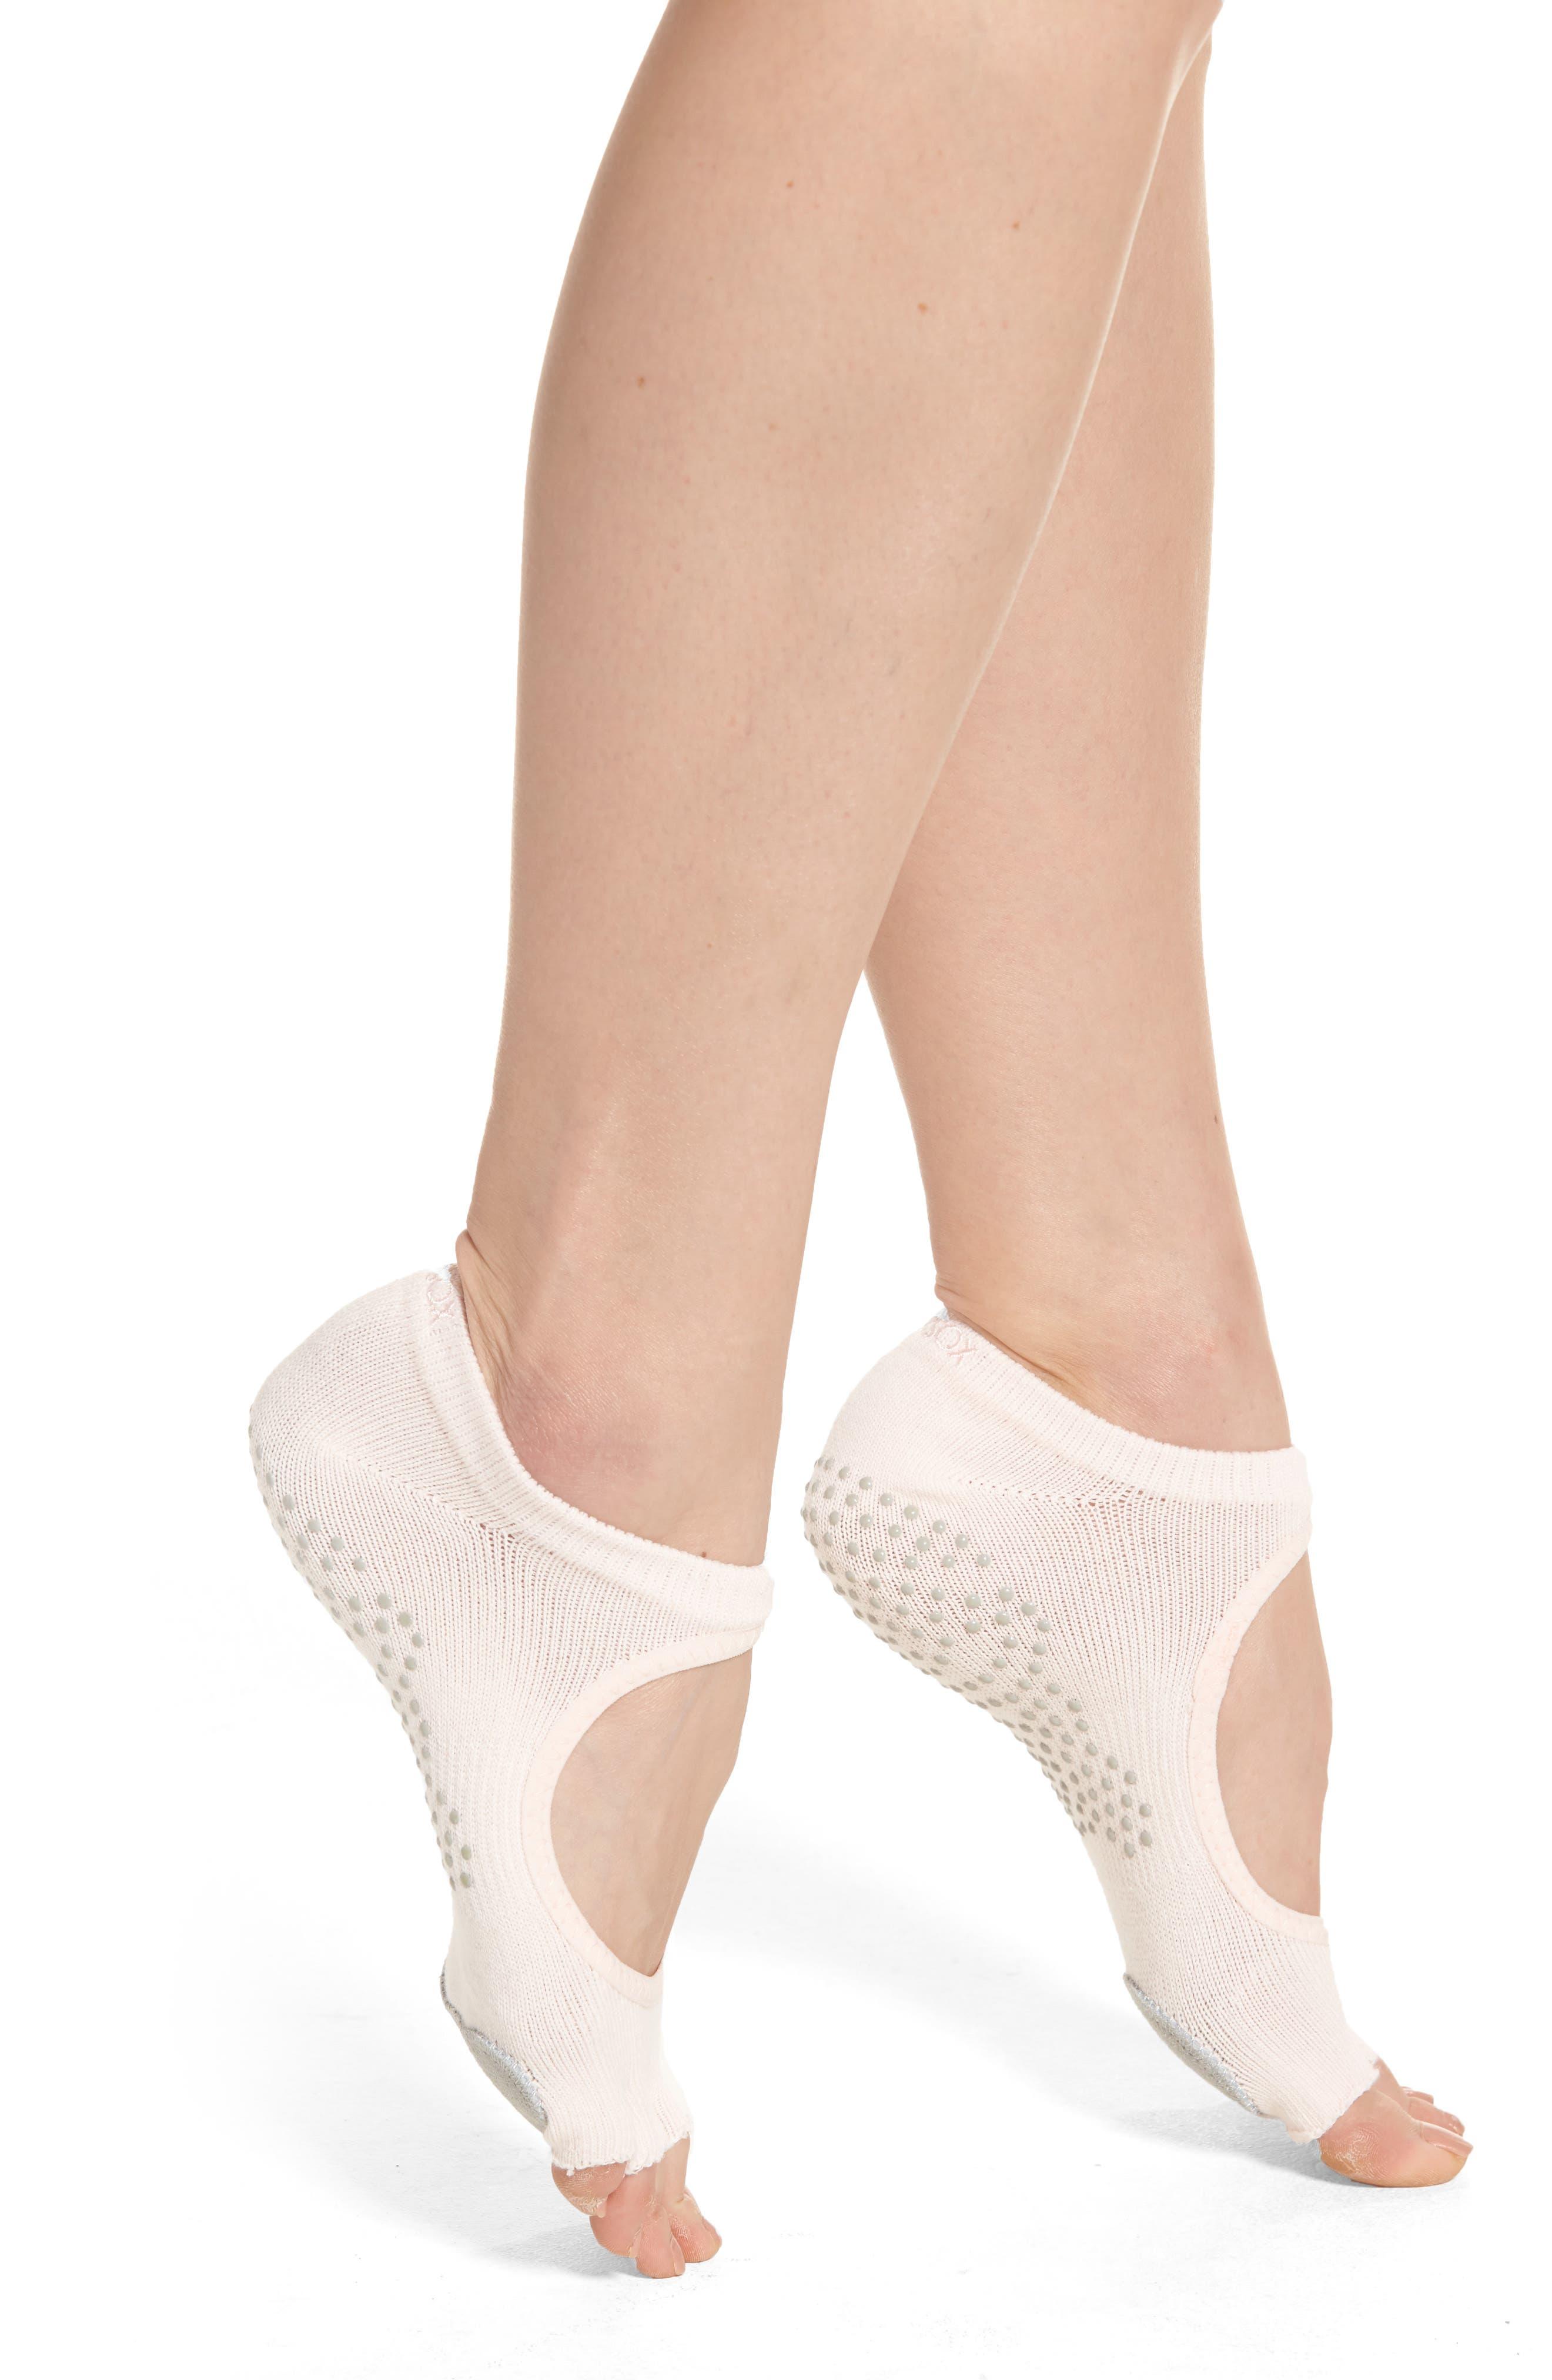 Alternate Image 1 Selected - ToeSox 'Dance Plié' Half-Toe Gripper Socks